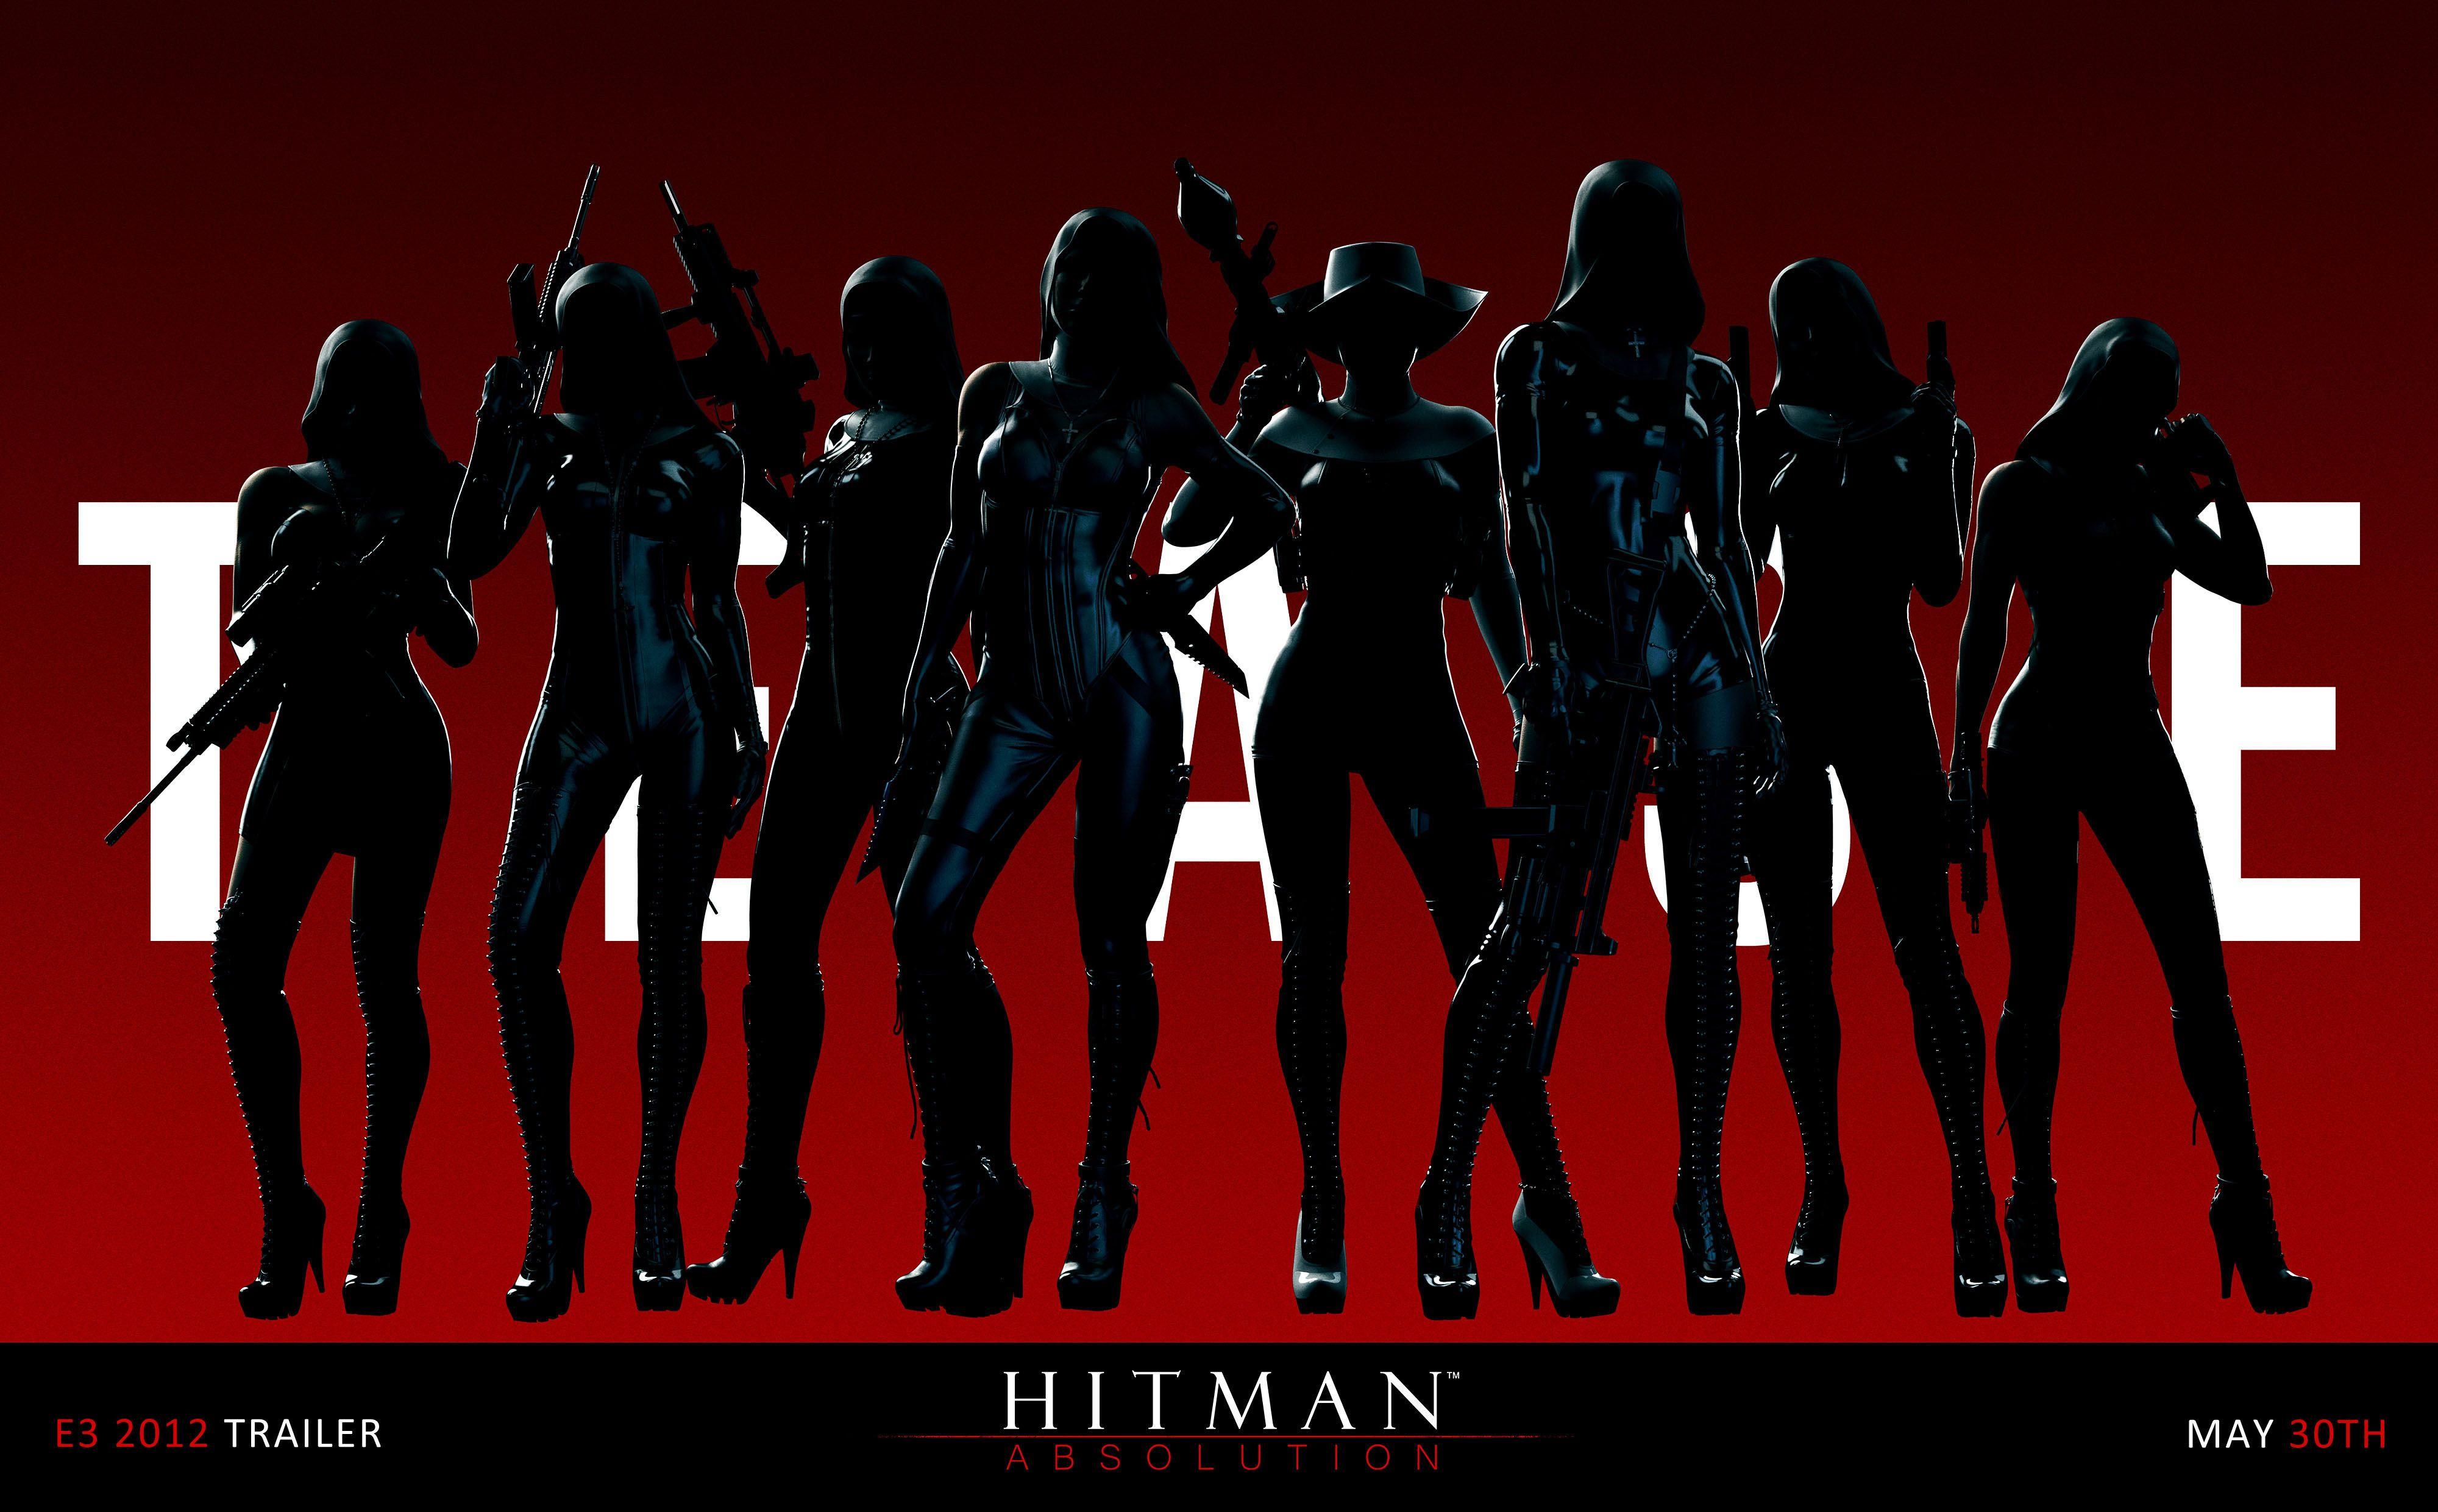 Hitman: Absolution - E3 2012 Trailer Teaser Image